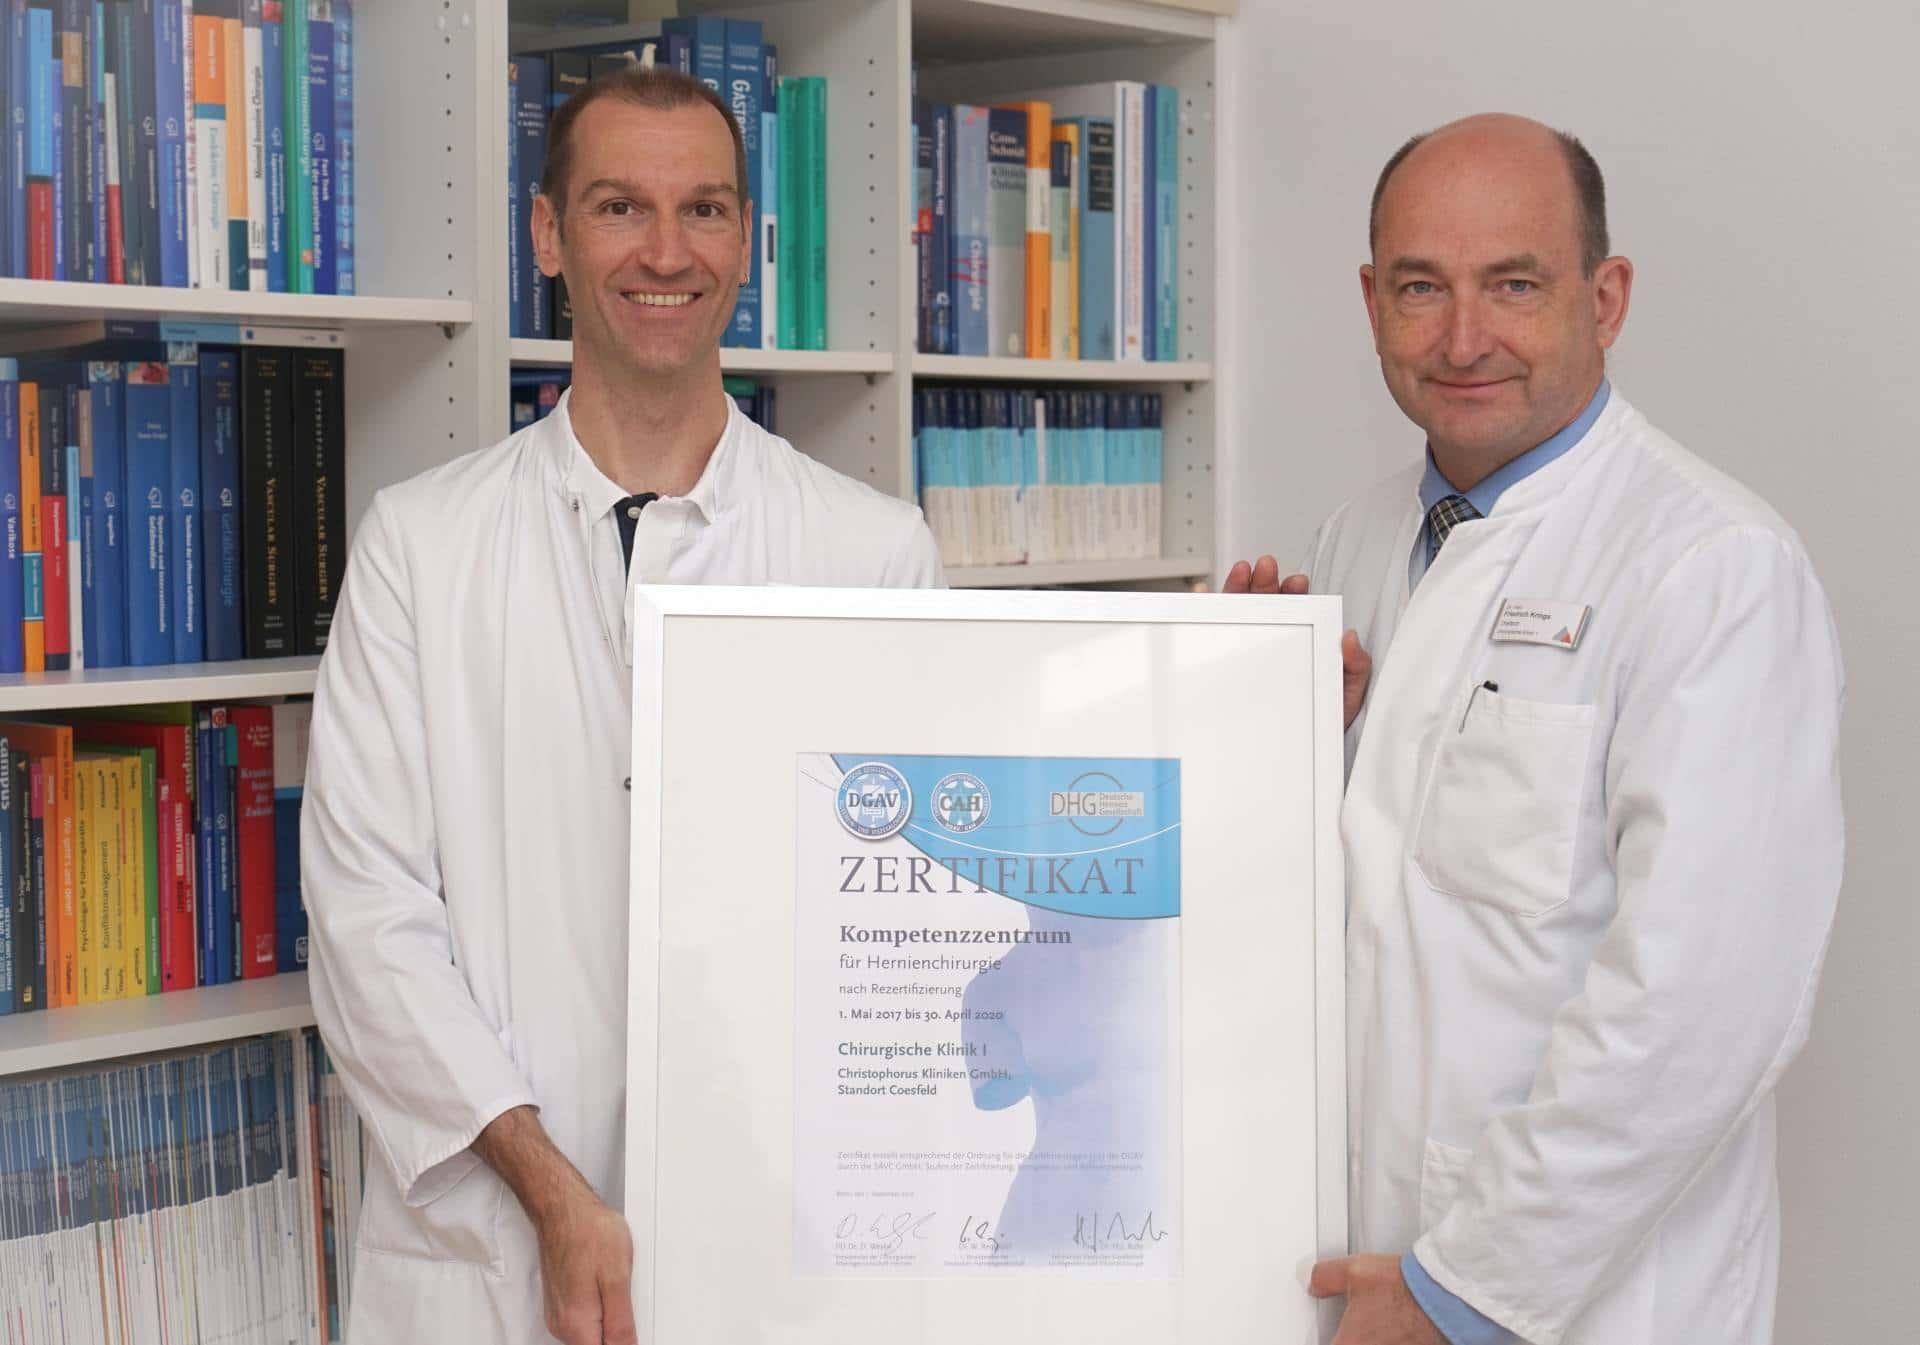 Hernienzentrum Christophorus-Kliniken